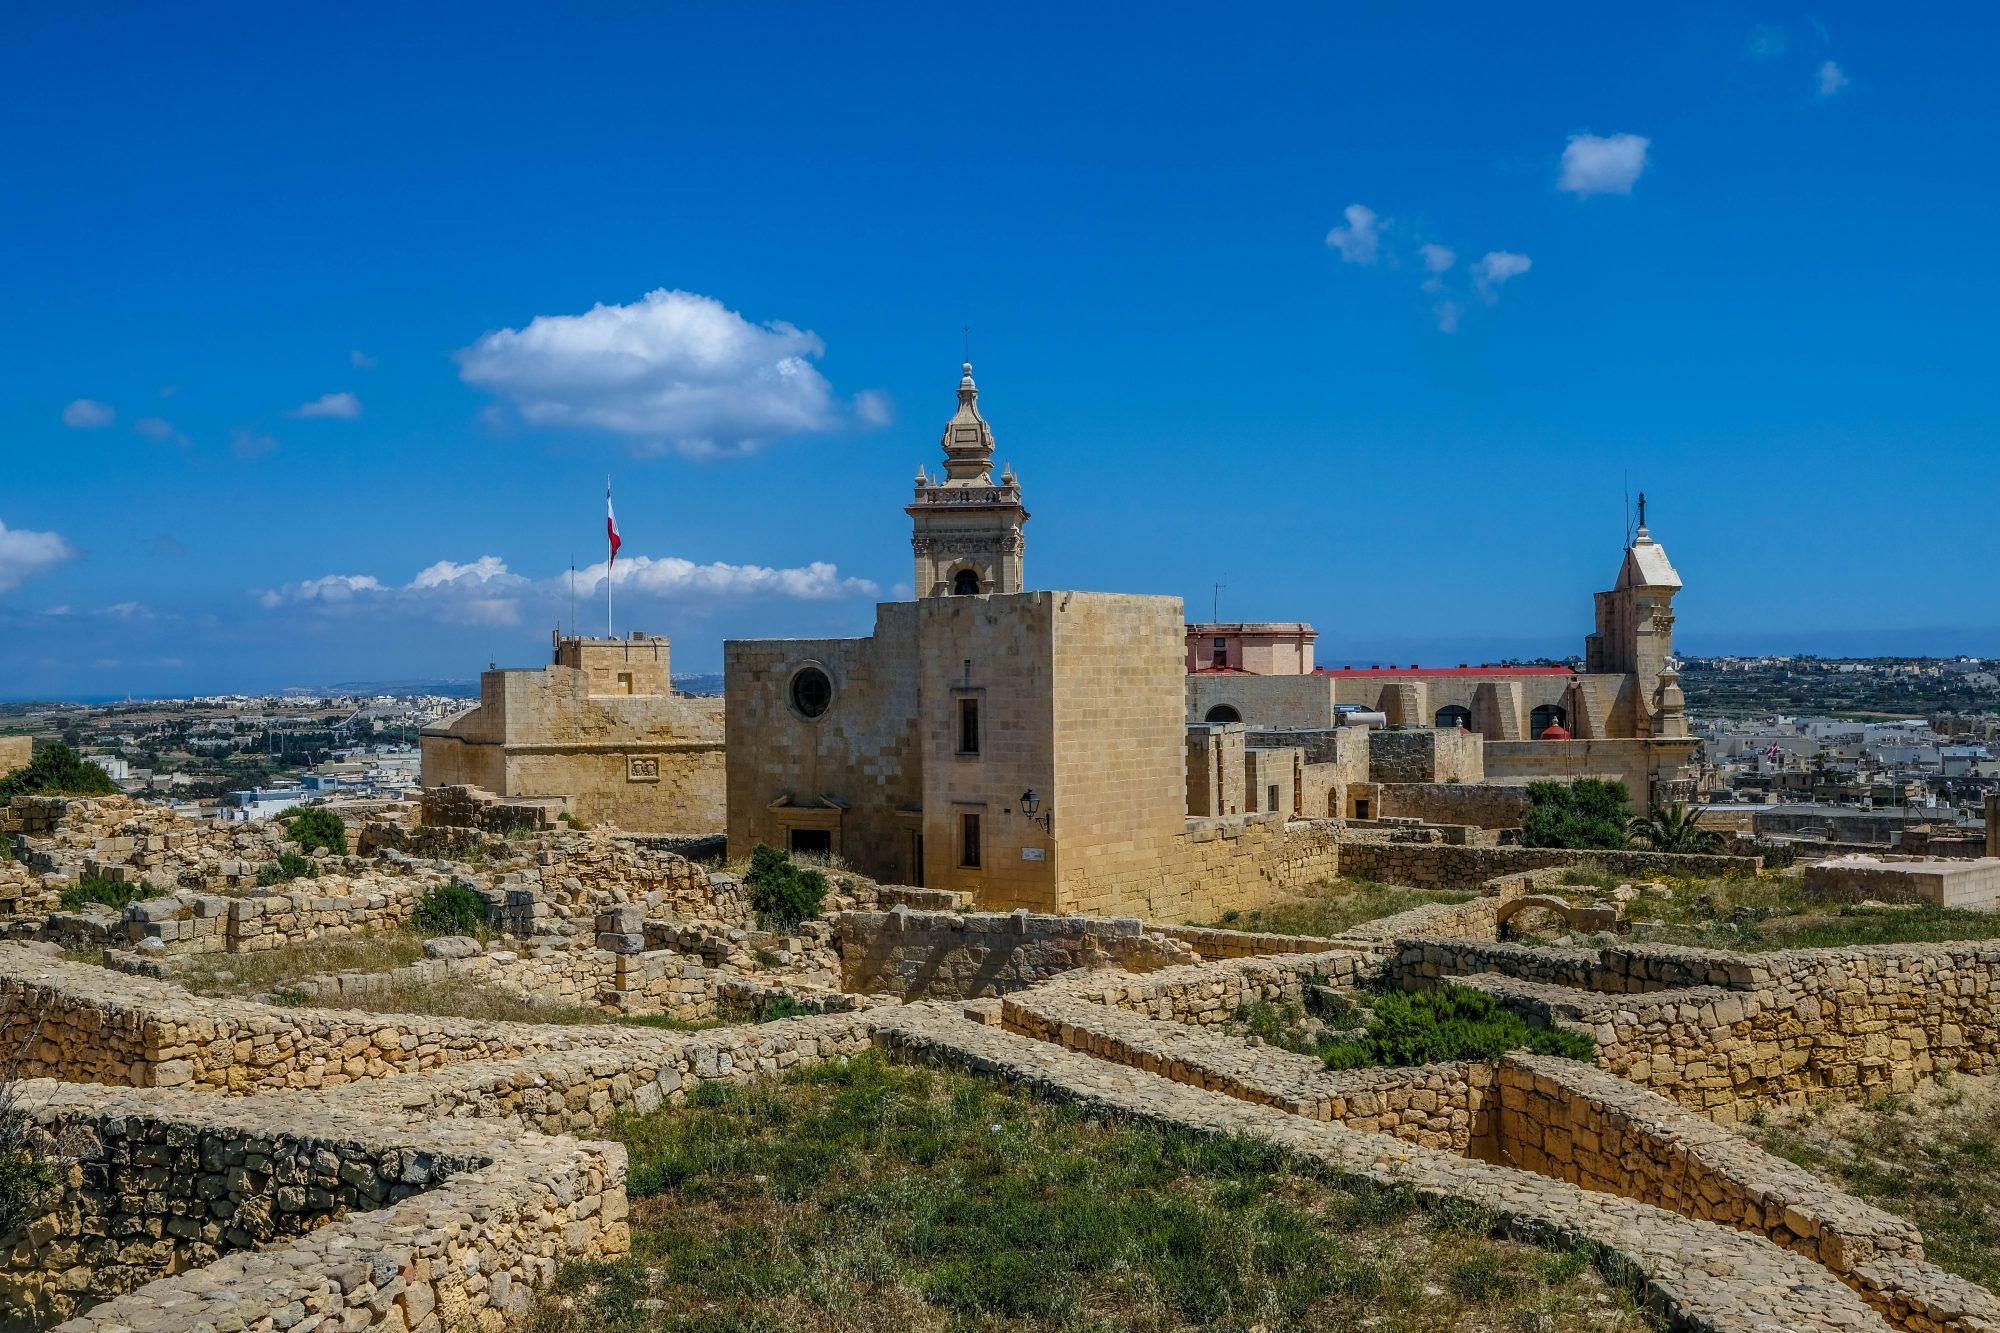 Vue depuis les remparts - Ir-Rabat Gozo Malte